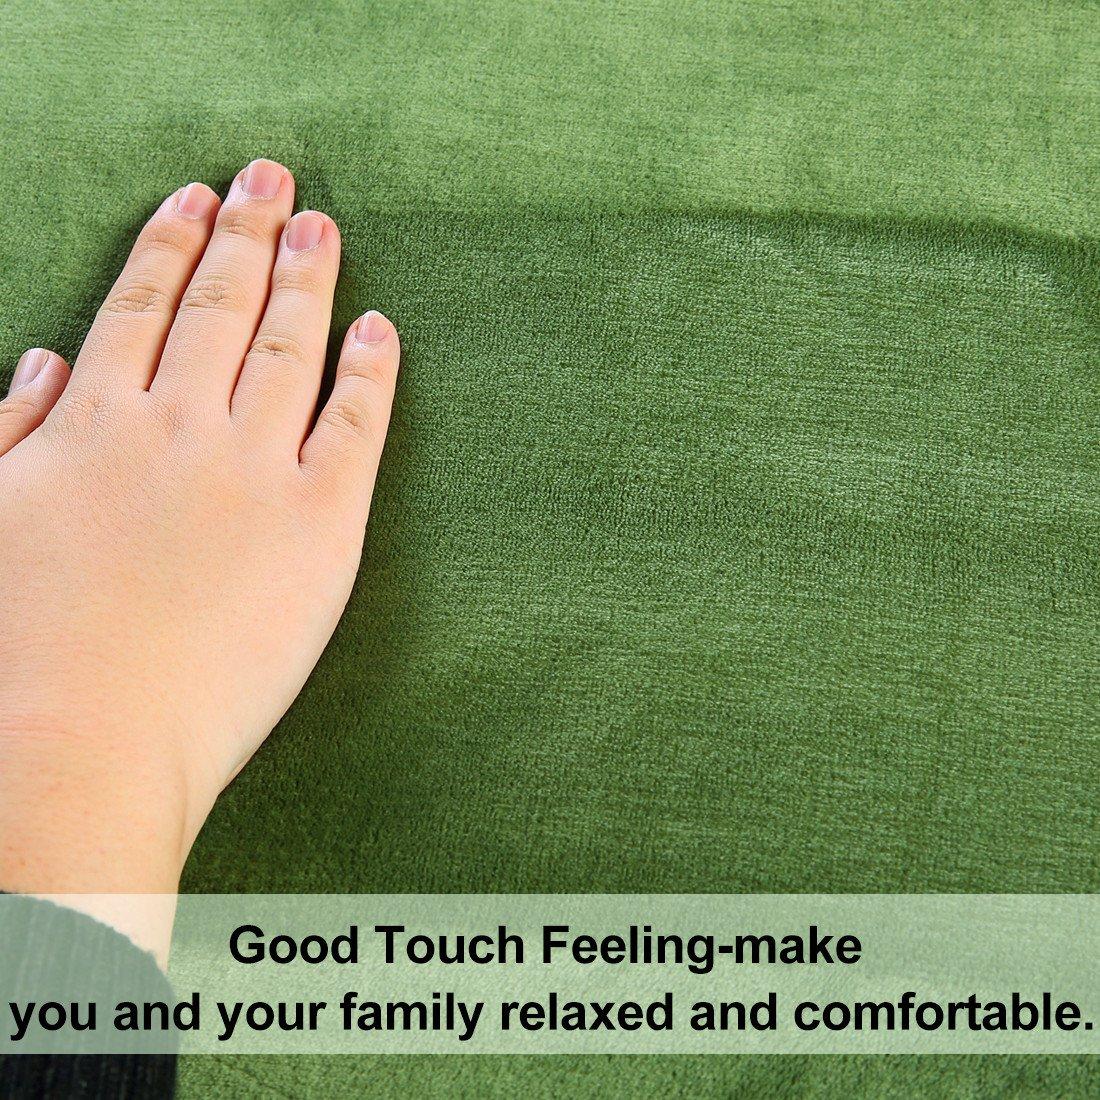 MEROUS Soft Twin Fleece Bed Blanket, Grass Green